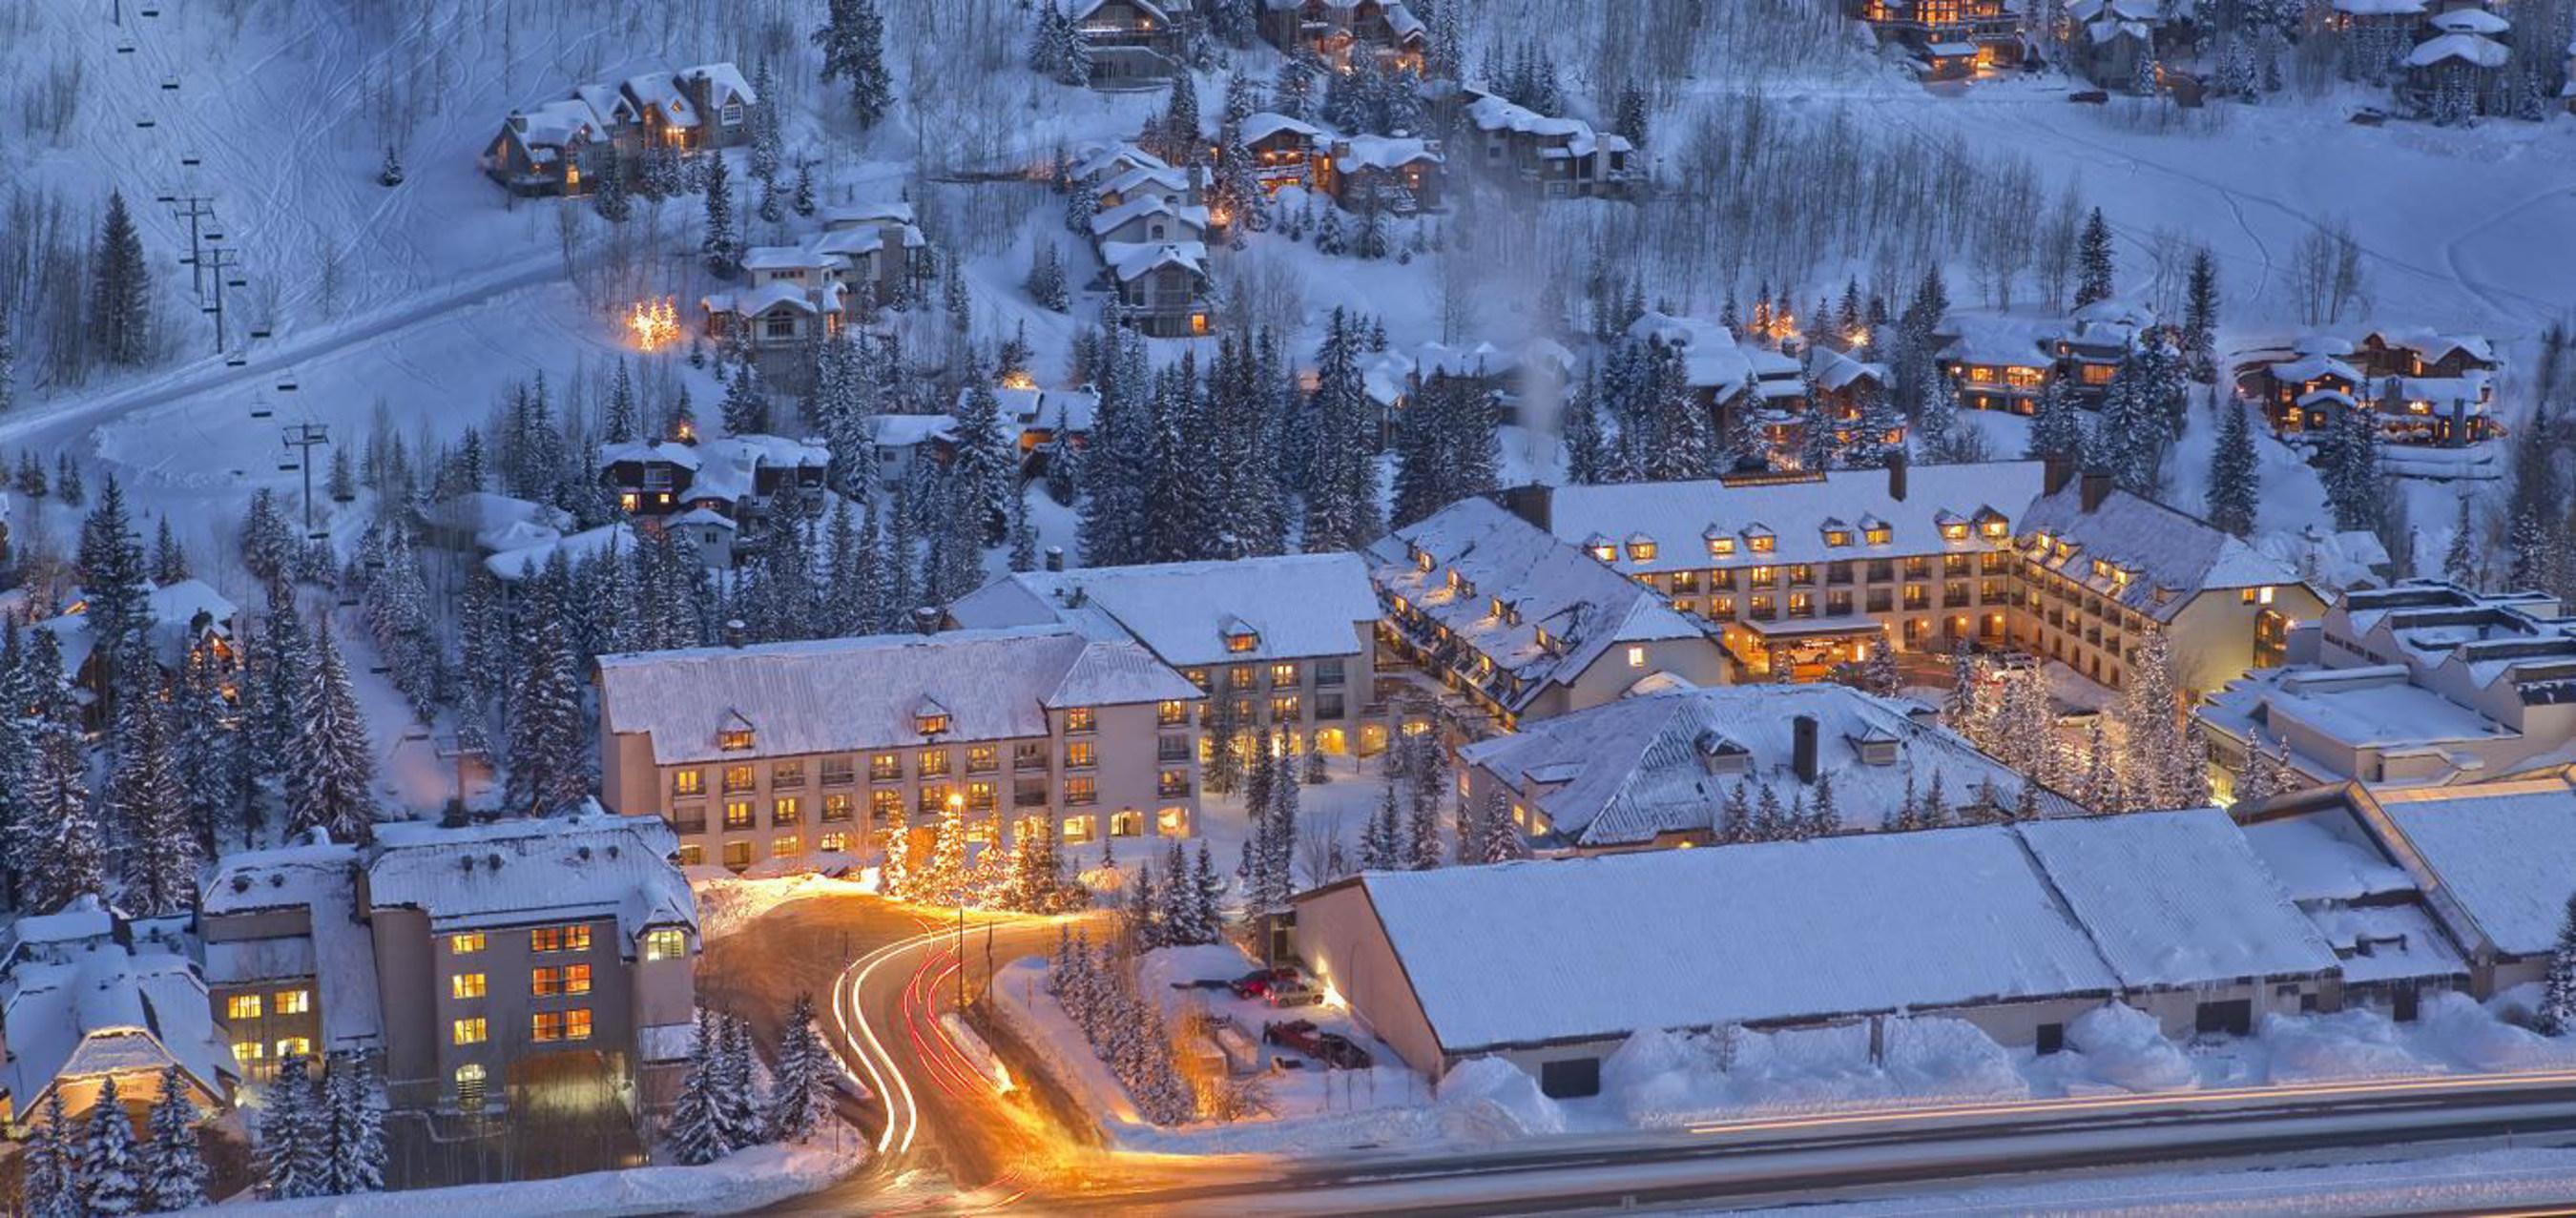 Vail Cascade Resort & Spa, Vail, Colorado